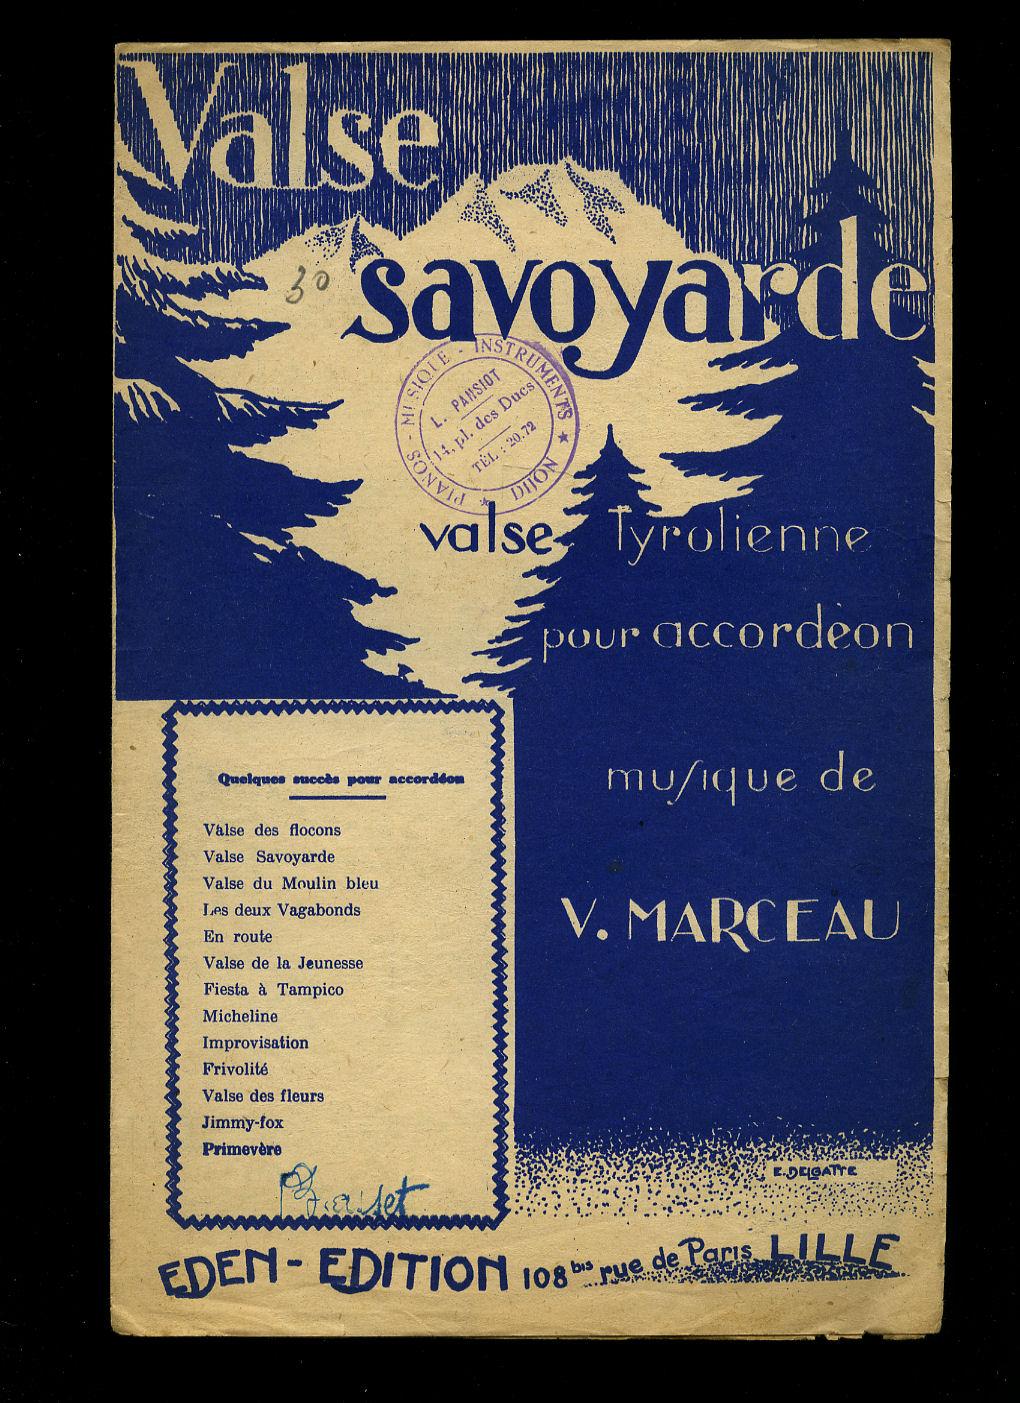 Rare & Secondhand Books, Rare & Used Textbooks, Rare & Out